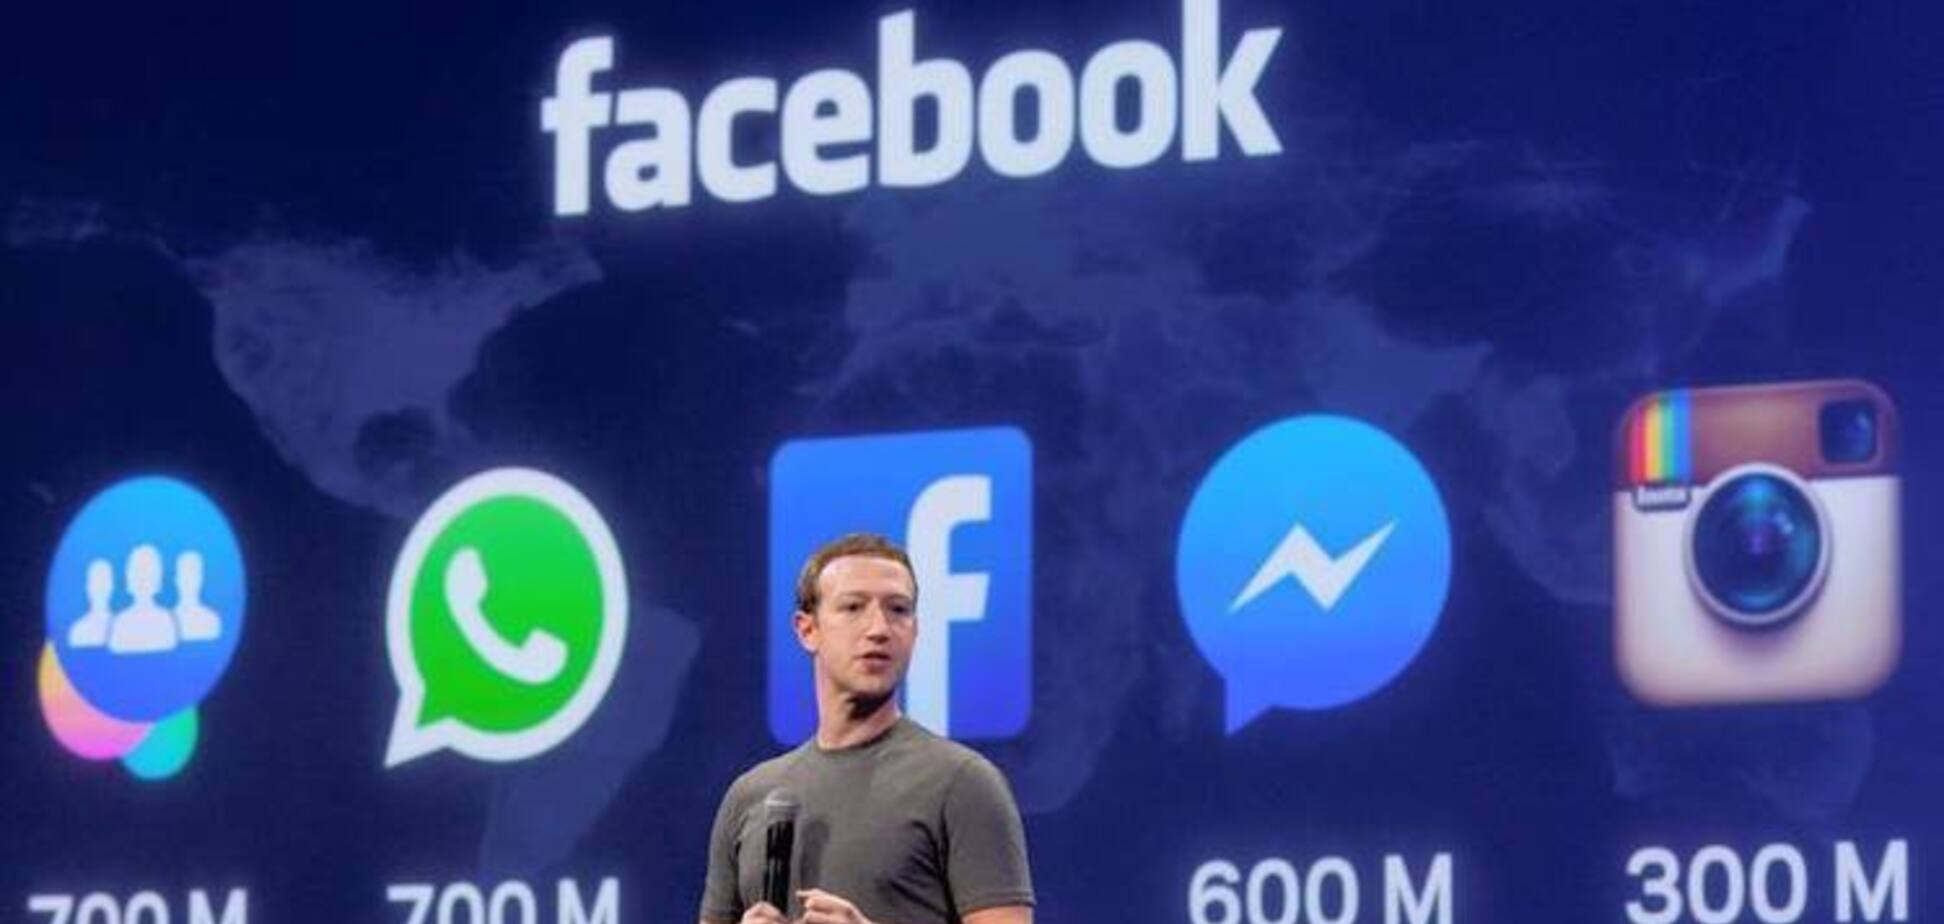 Слежка за Android, SMS и звонками: топ-5 возмутивших мир скандалов Facebook